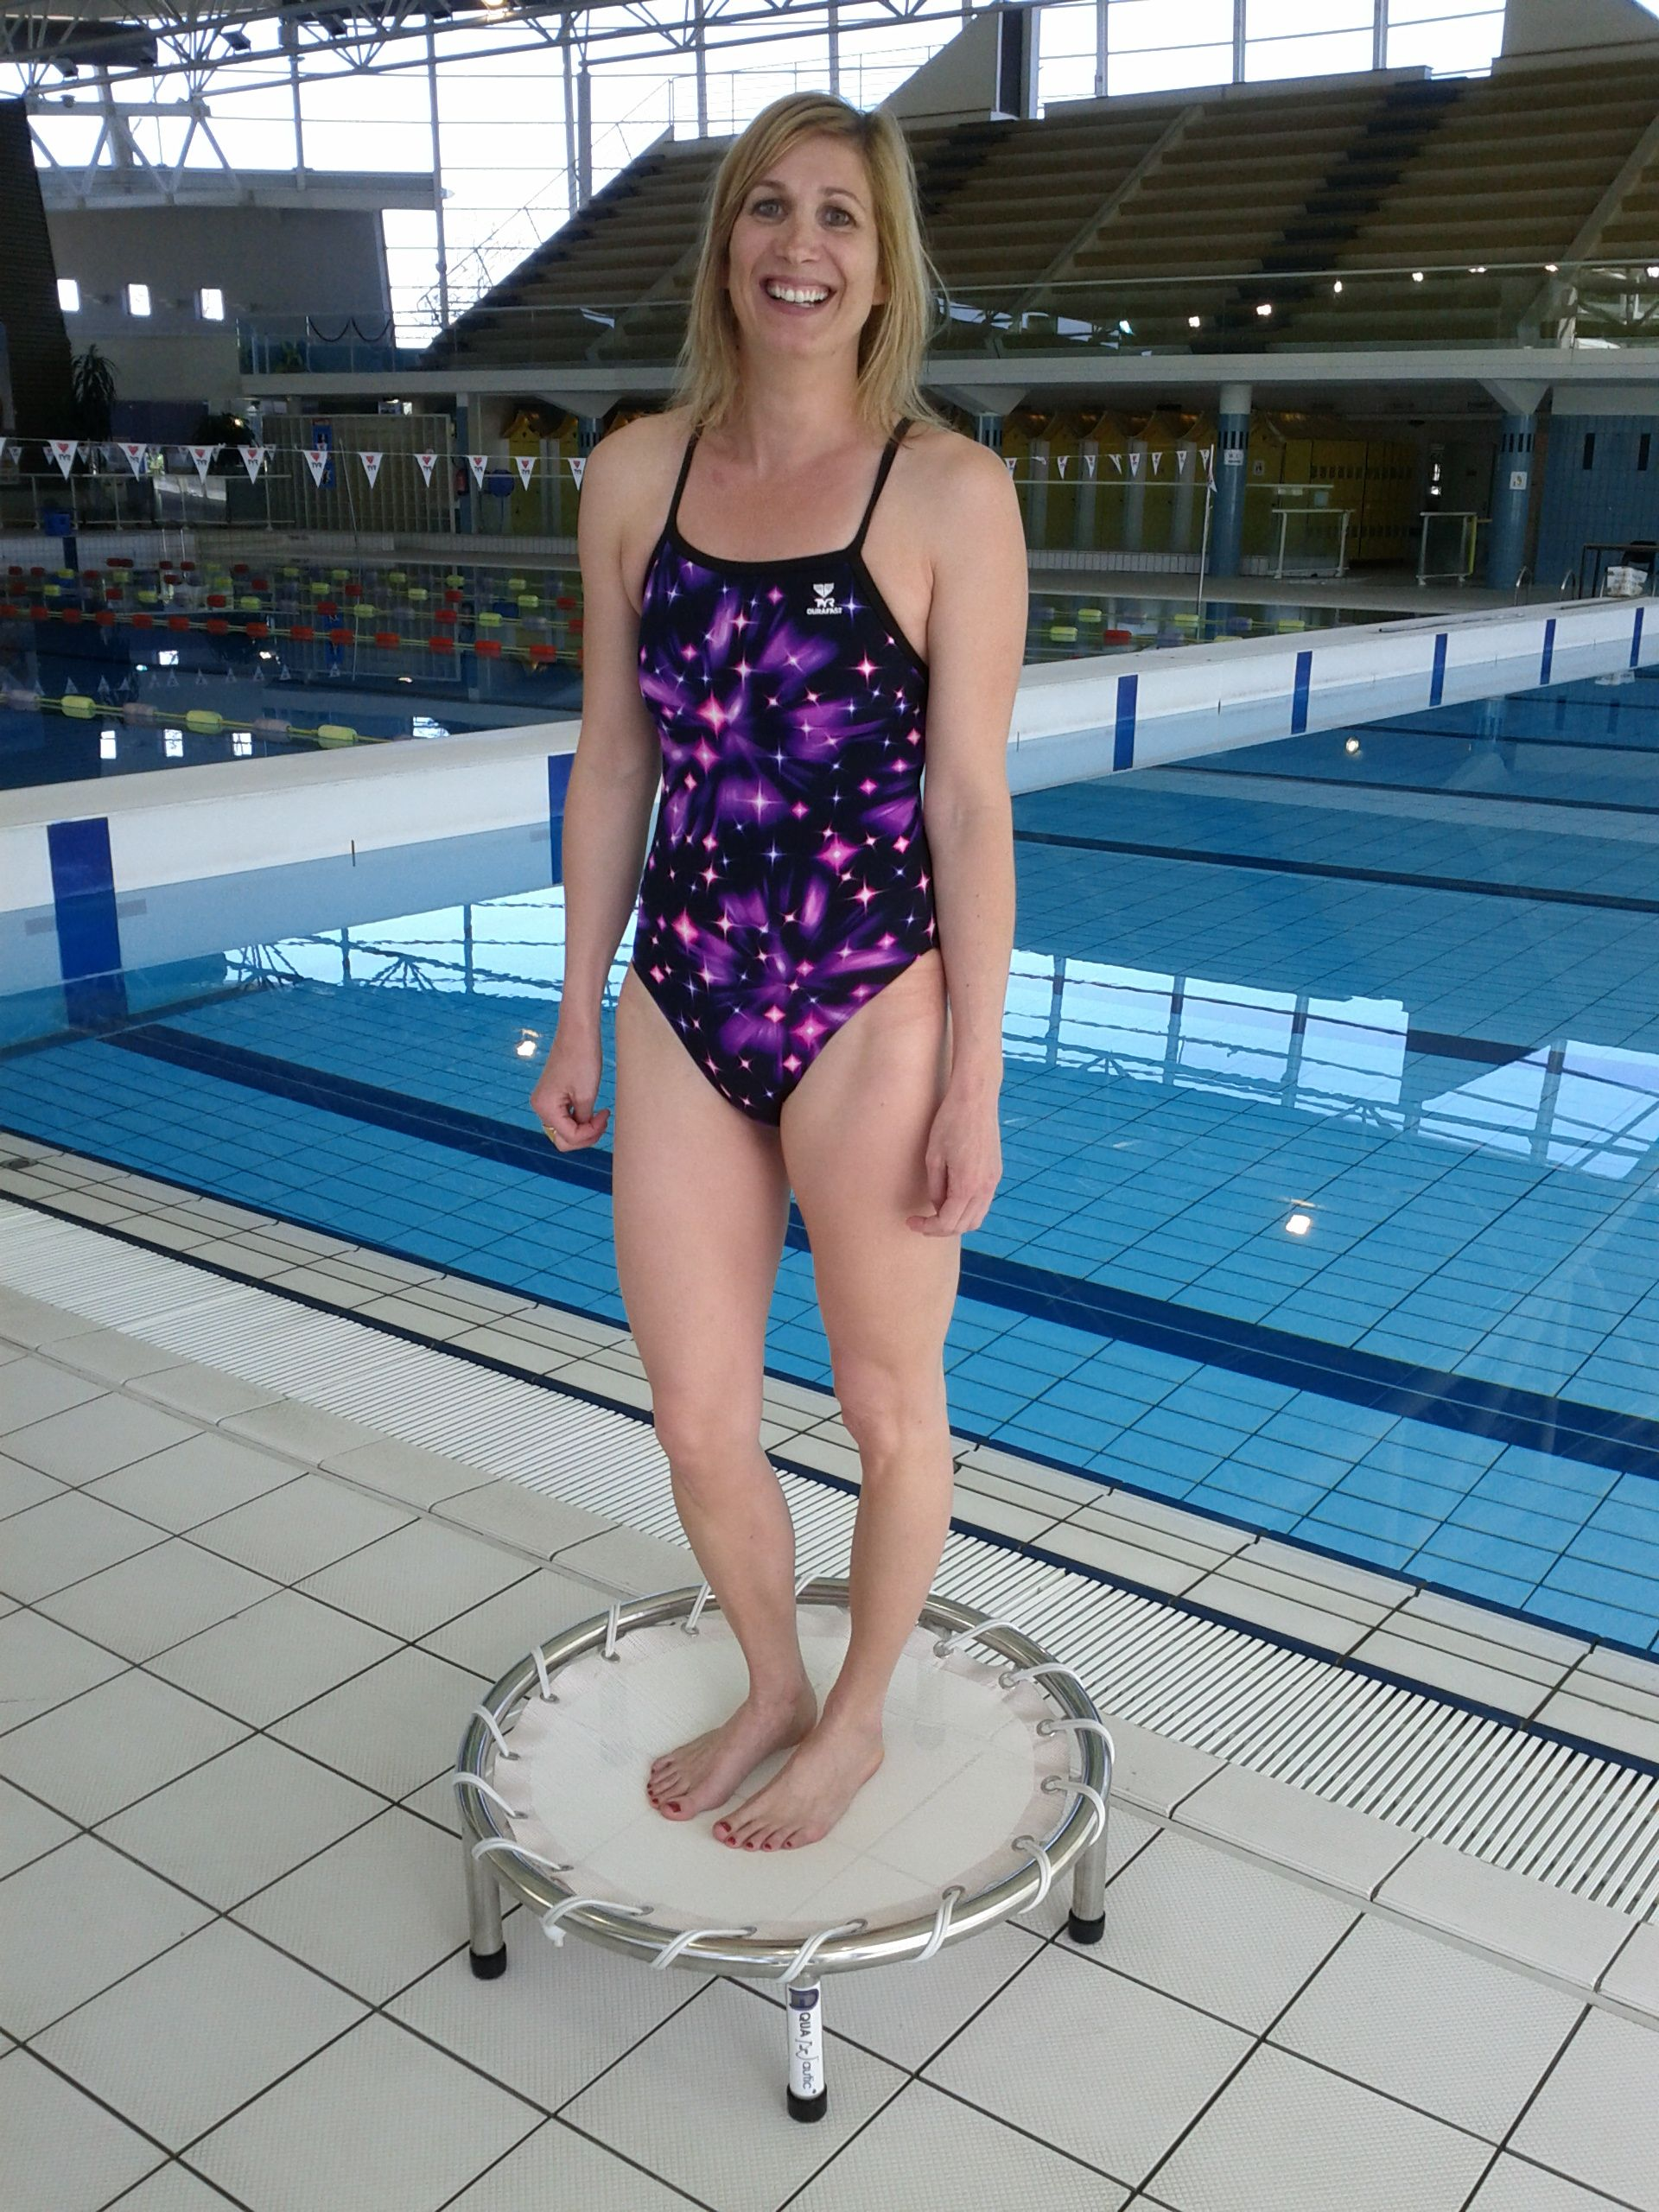 Trampoline aquatique pour piscine avec KARINE BREMOND 14 titres